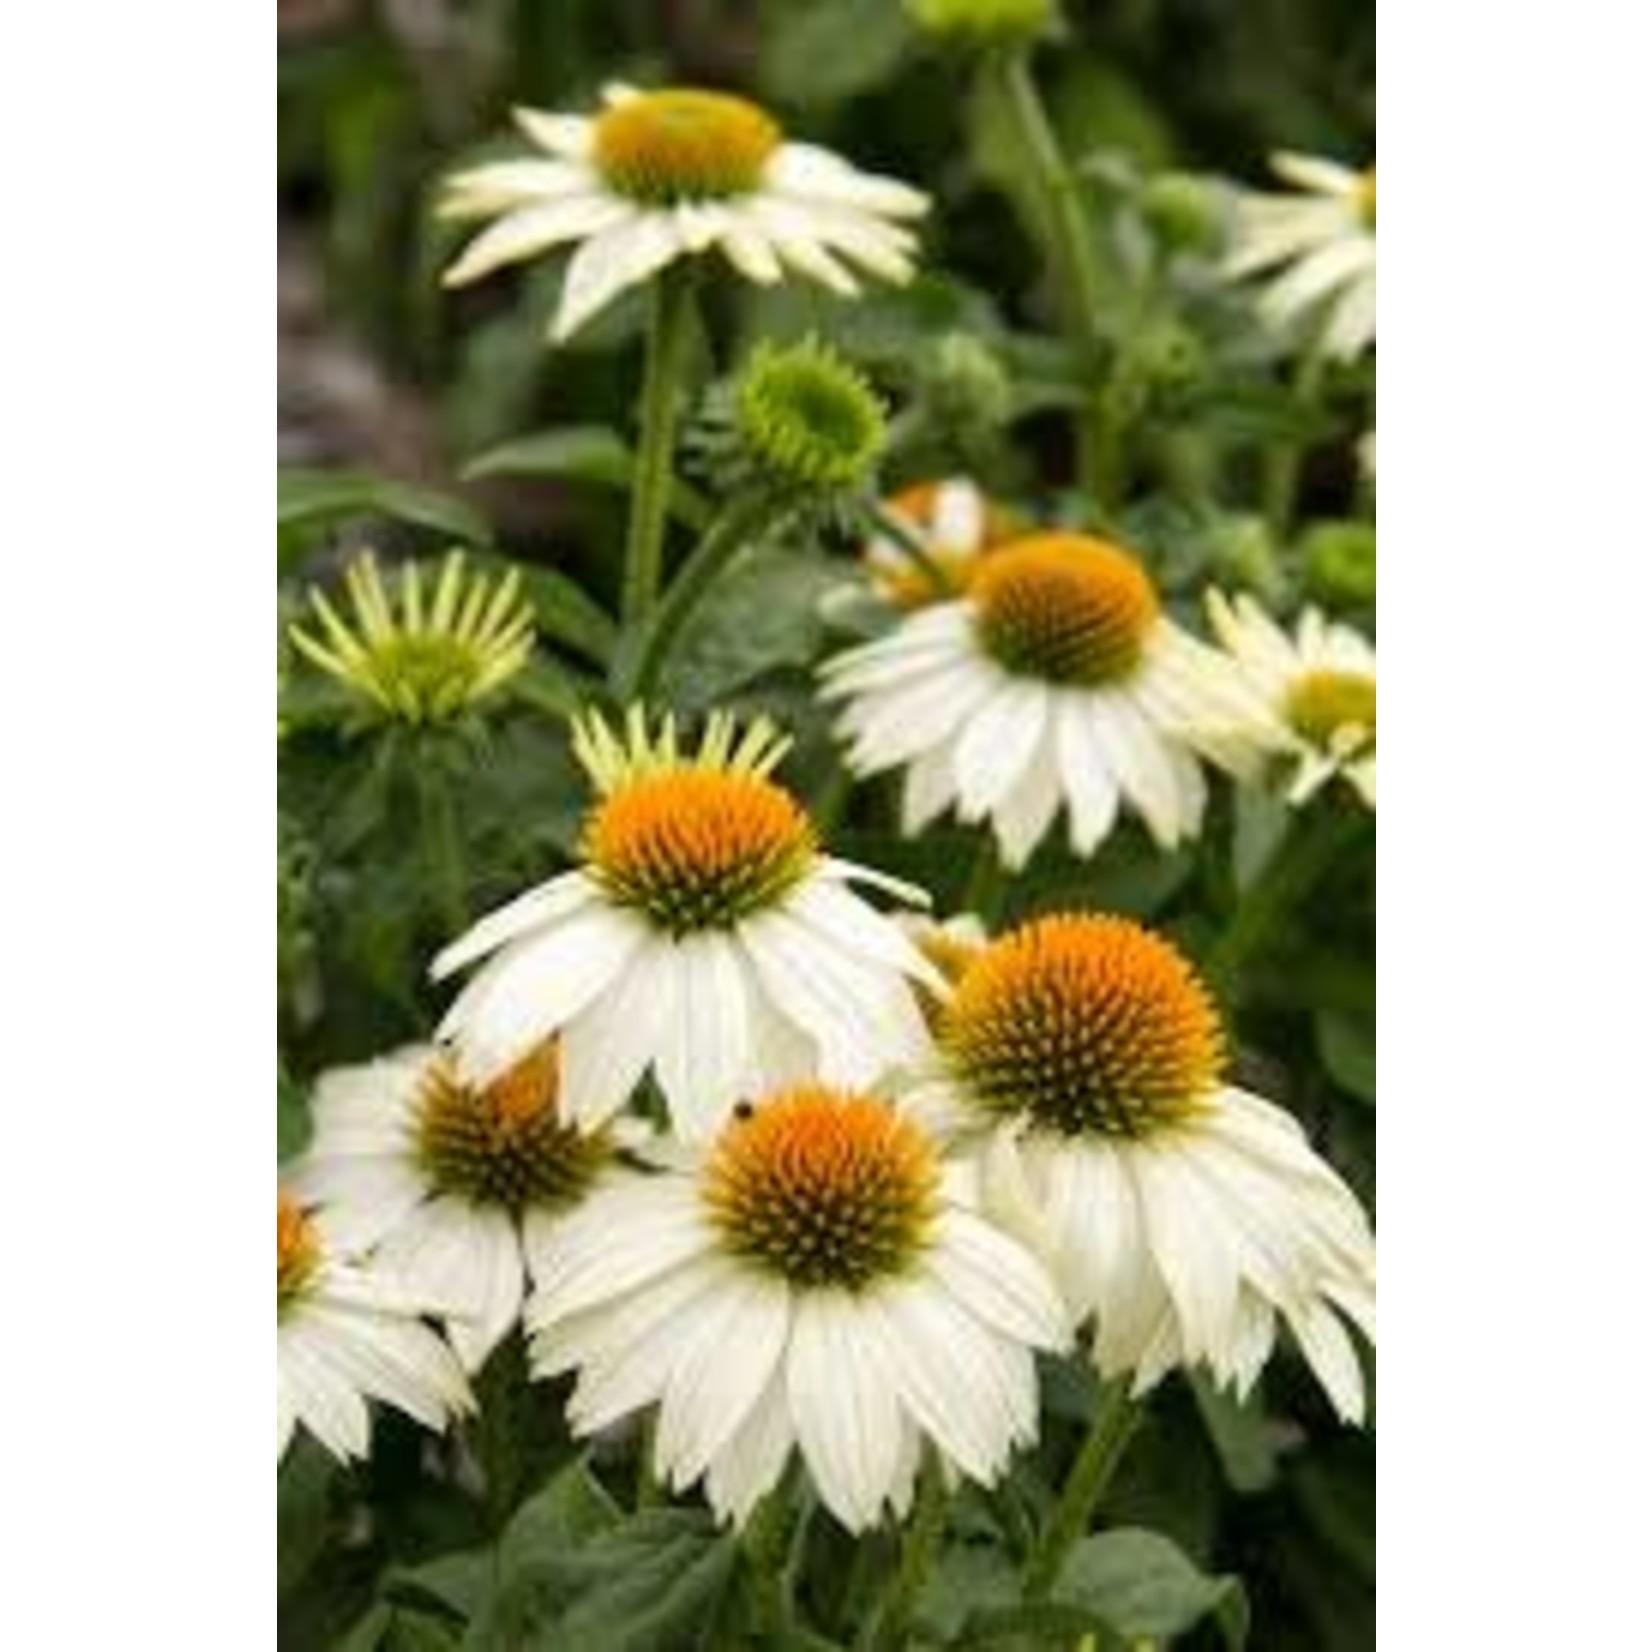 Cone Flower 'Echinacea Pow Wow White' - 2 gal GS